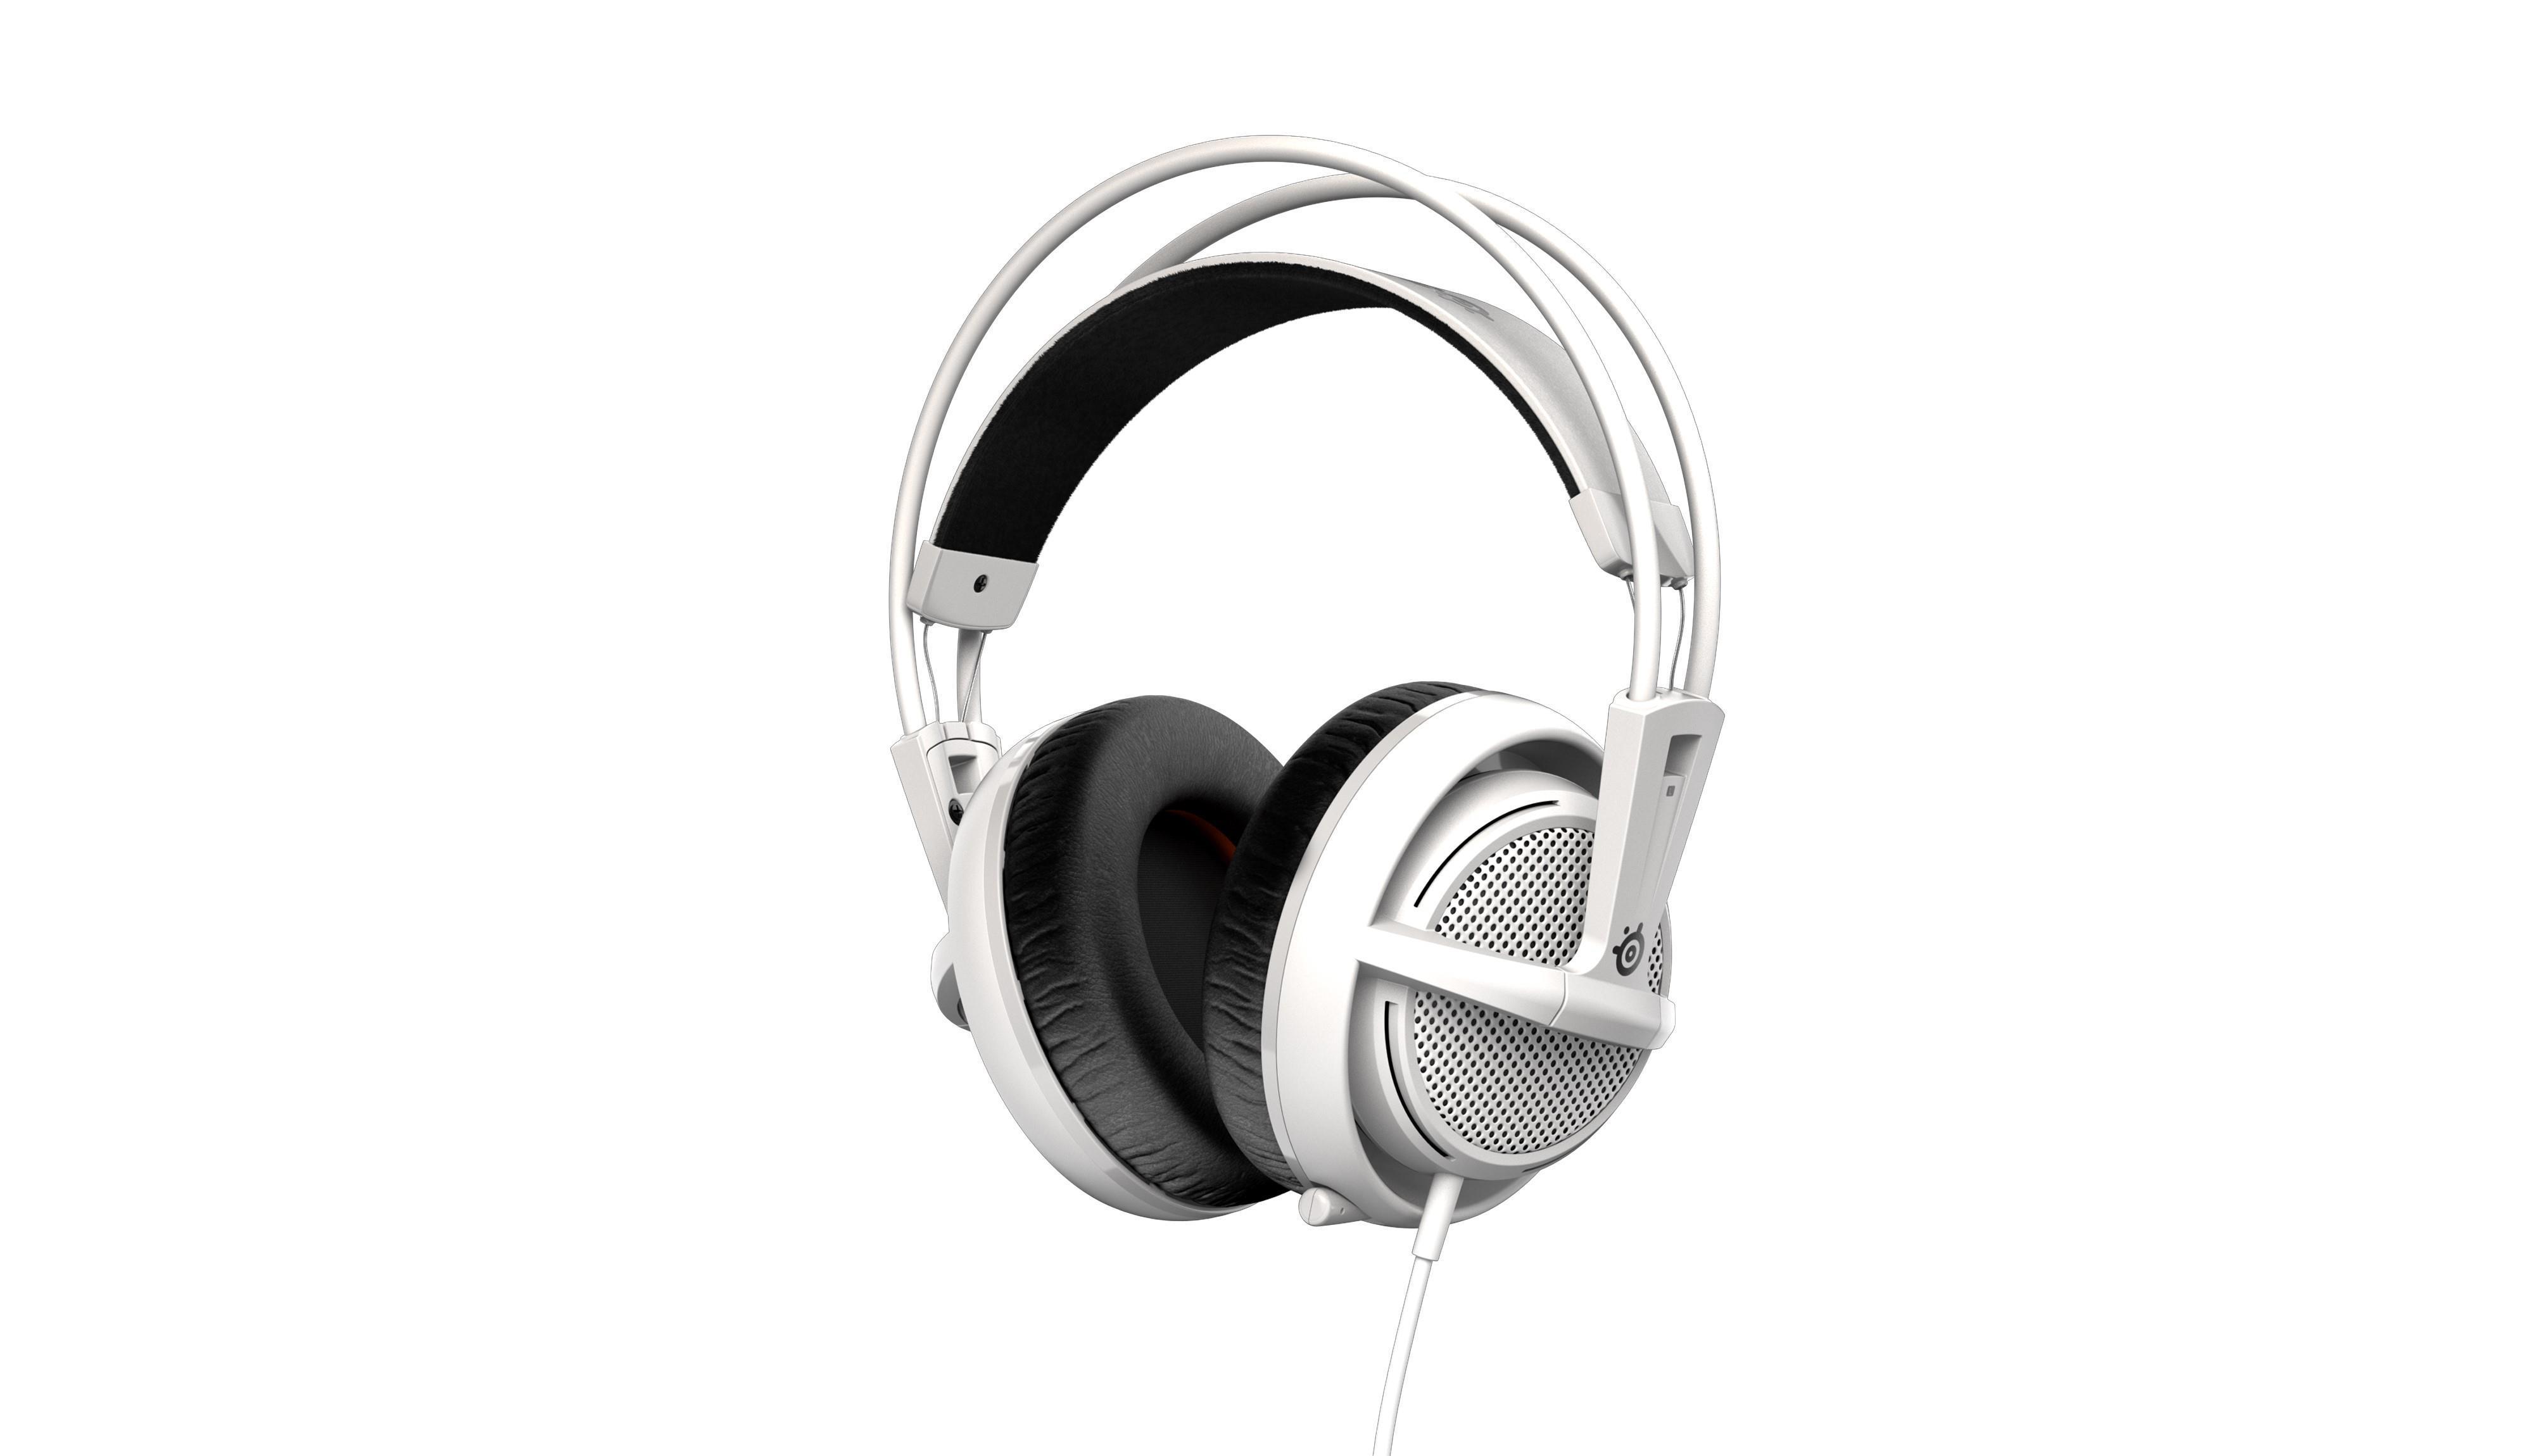 Corsair Gaming Void Rgb Usb Dolby 71 Headset White Steelseries Siberia 200 Stereo